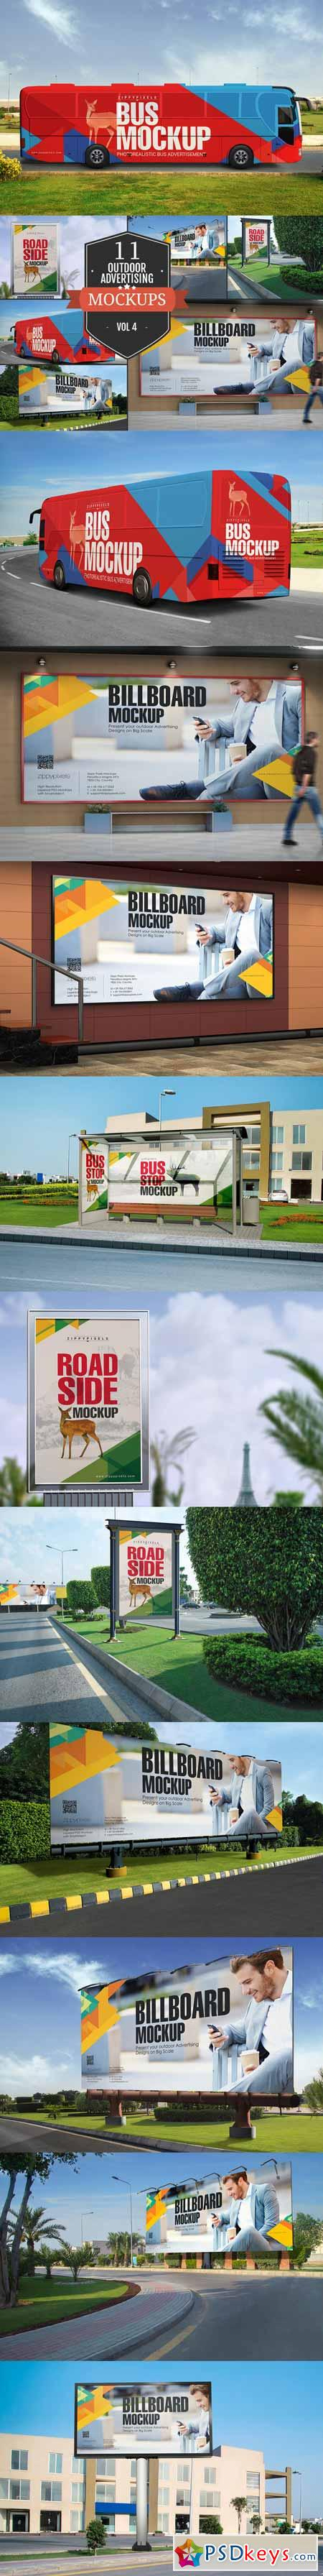 Outdoor Advertising Mockups Vol. 4 372126